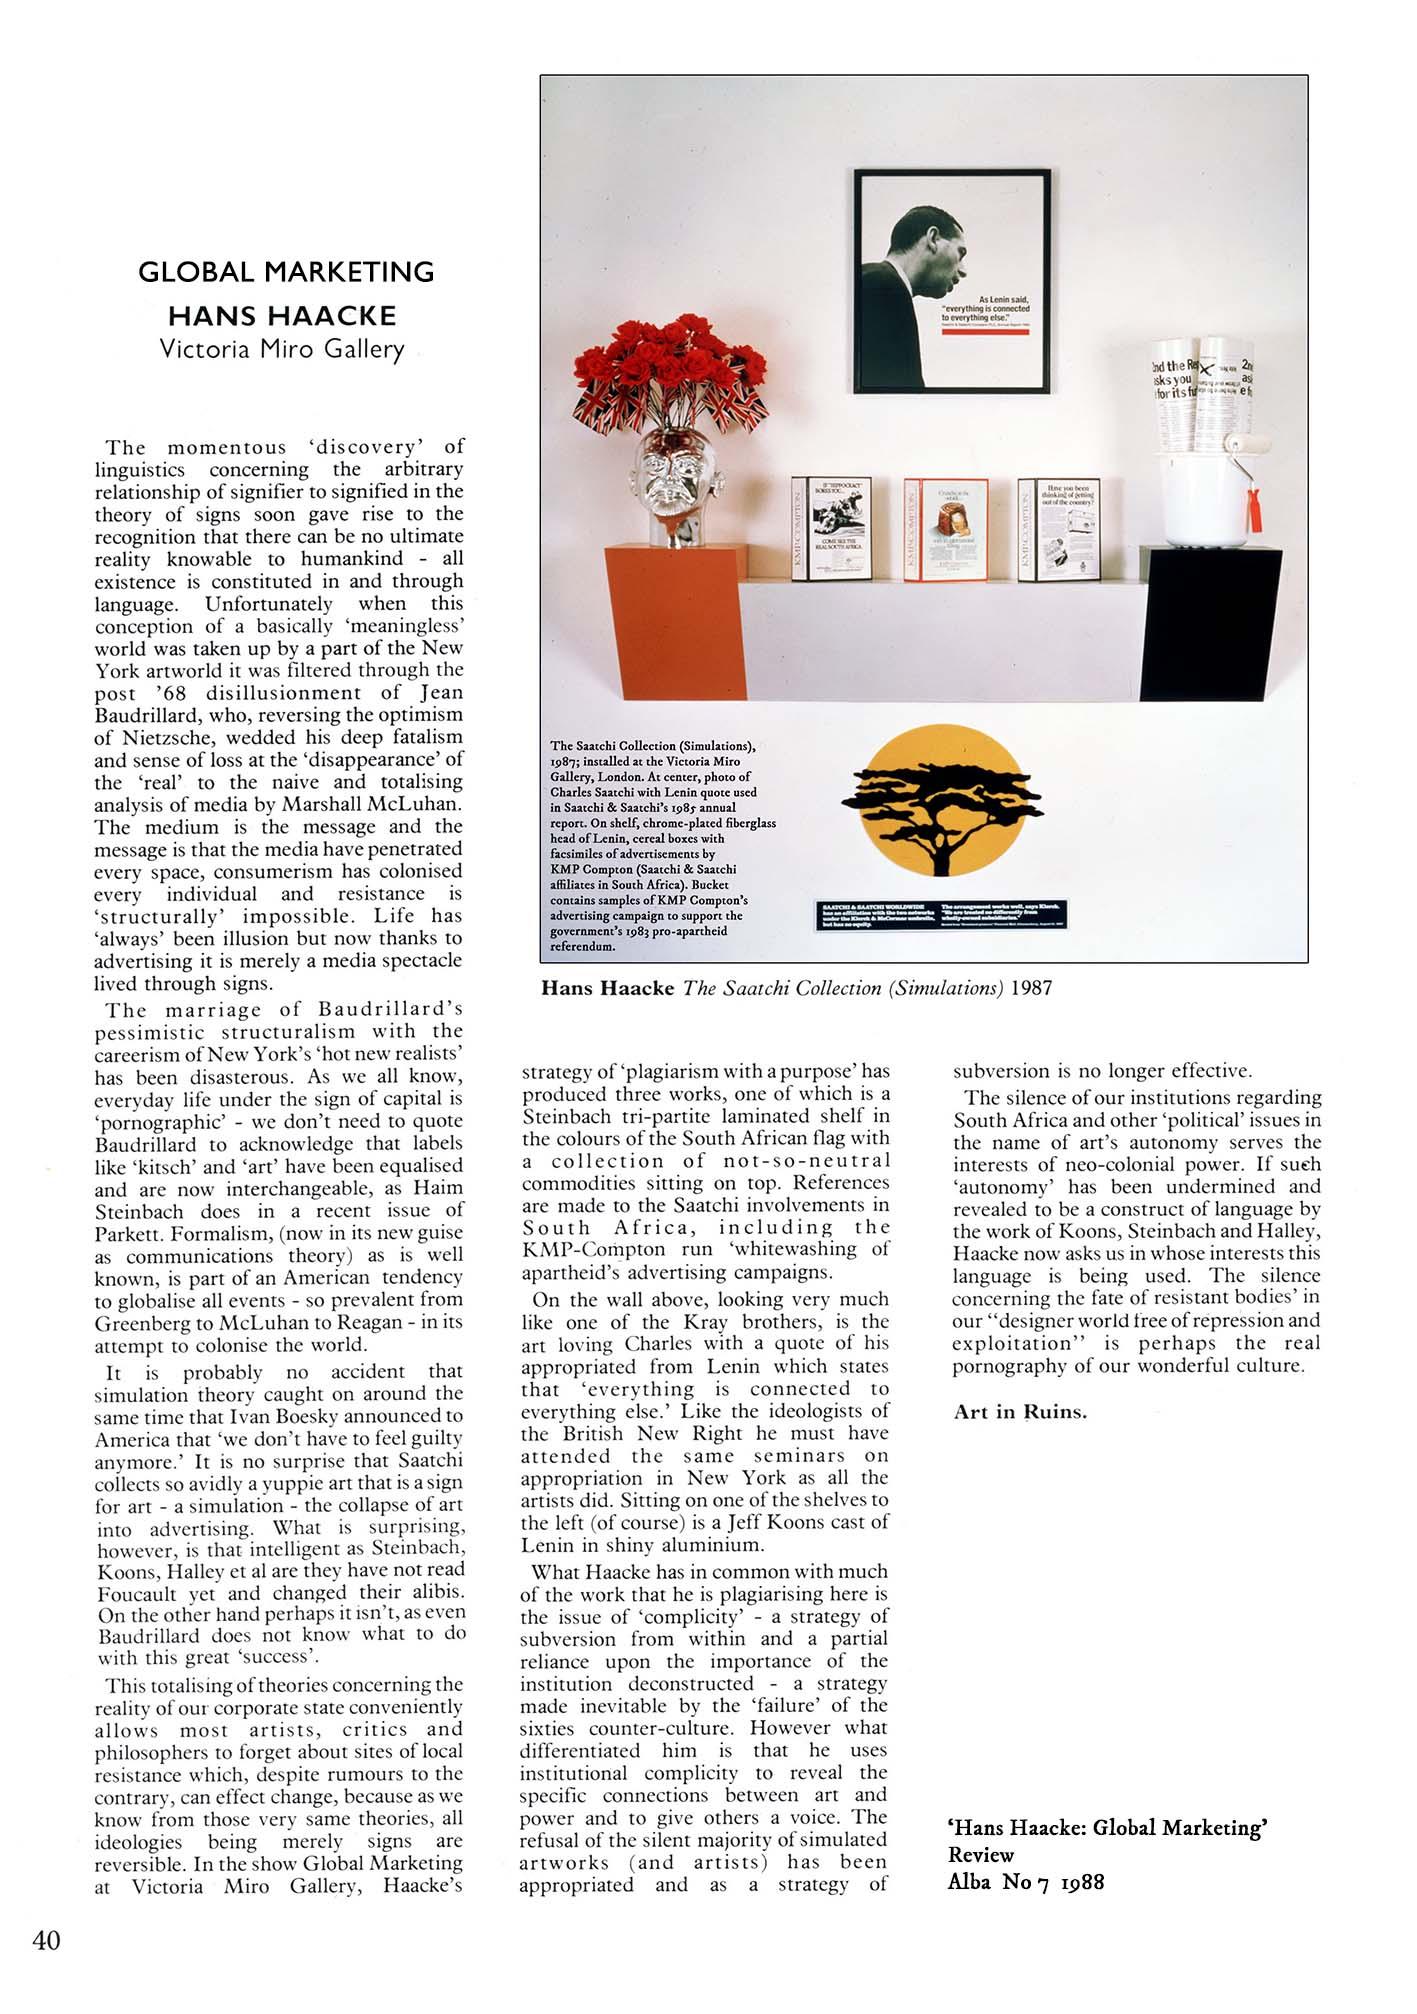 Hans Haacke Review Alba 1988